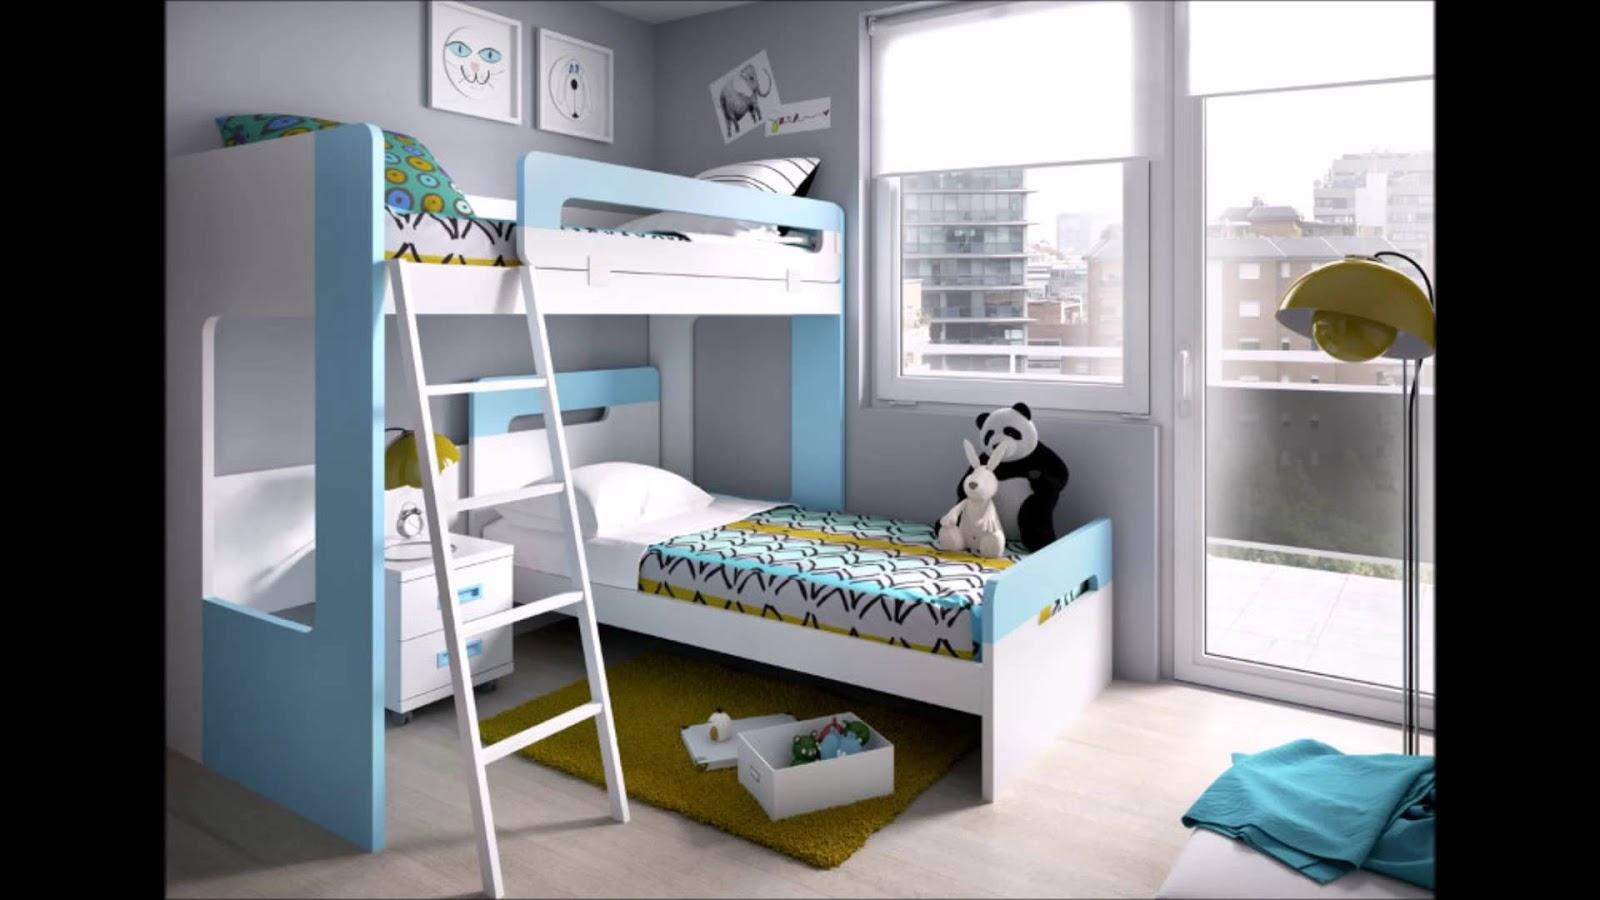 Apuntes revista digital de arquitectura mobiliario de for Muebles infantiles modernos